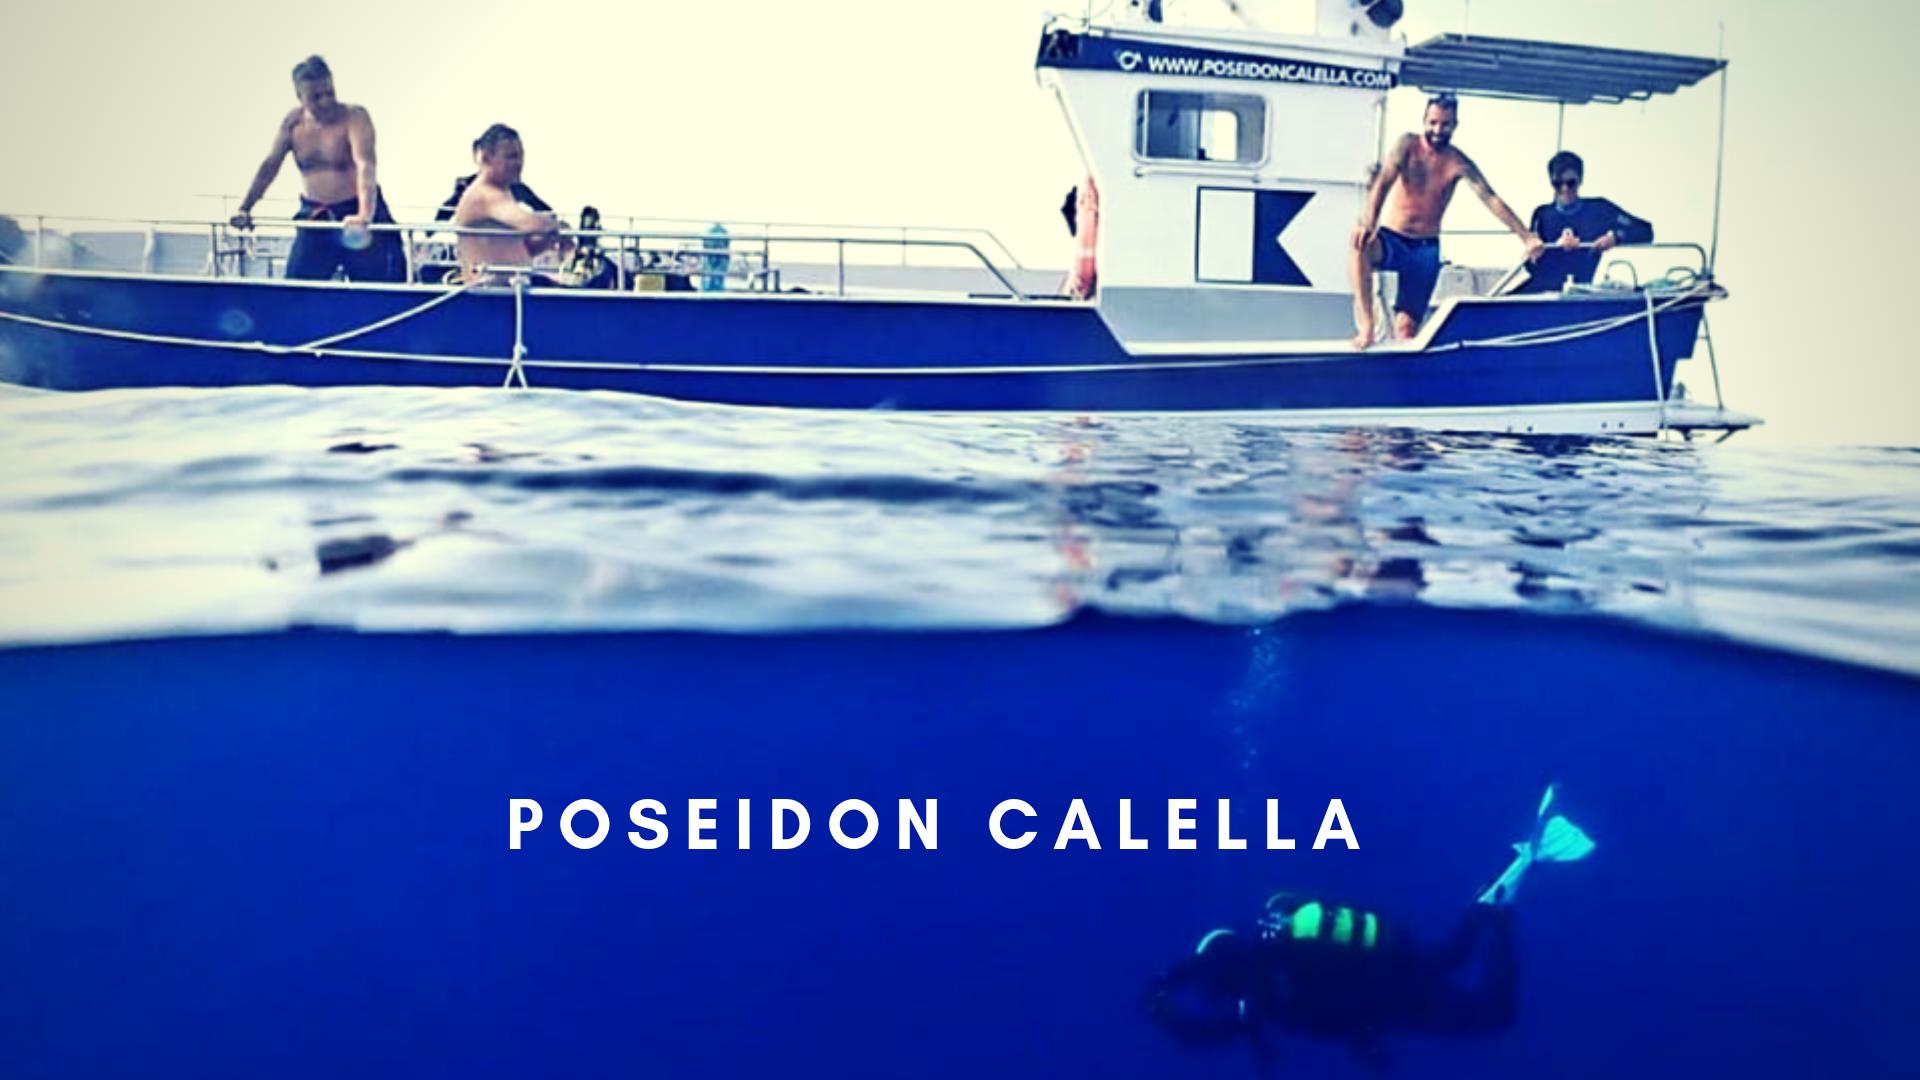 Poseidon calella de palafrugell